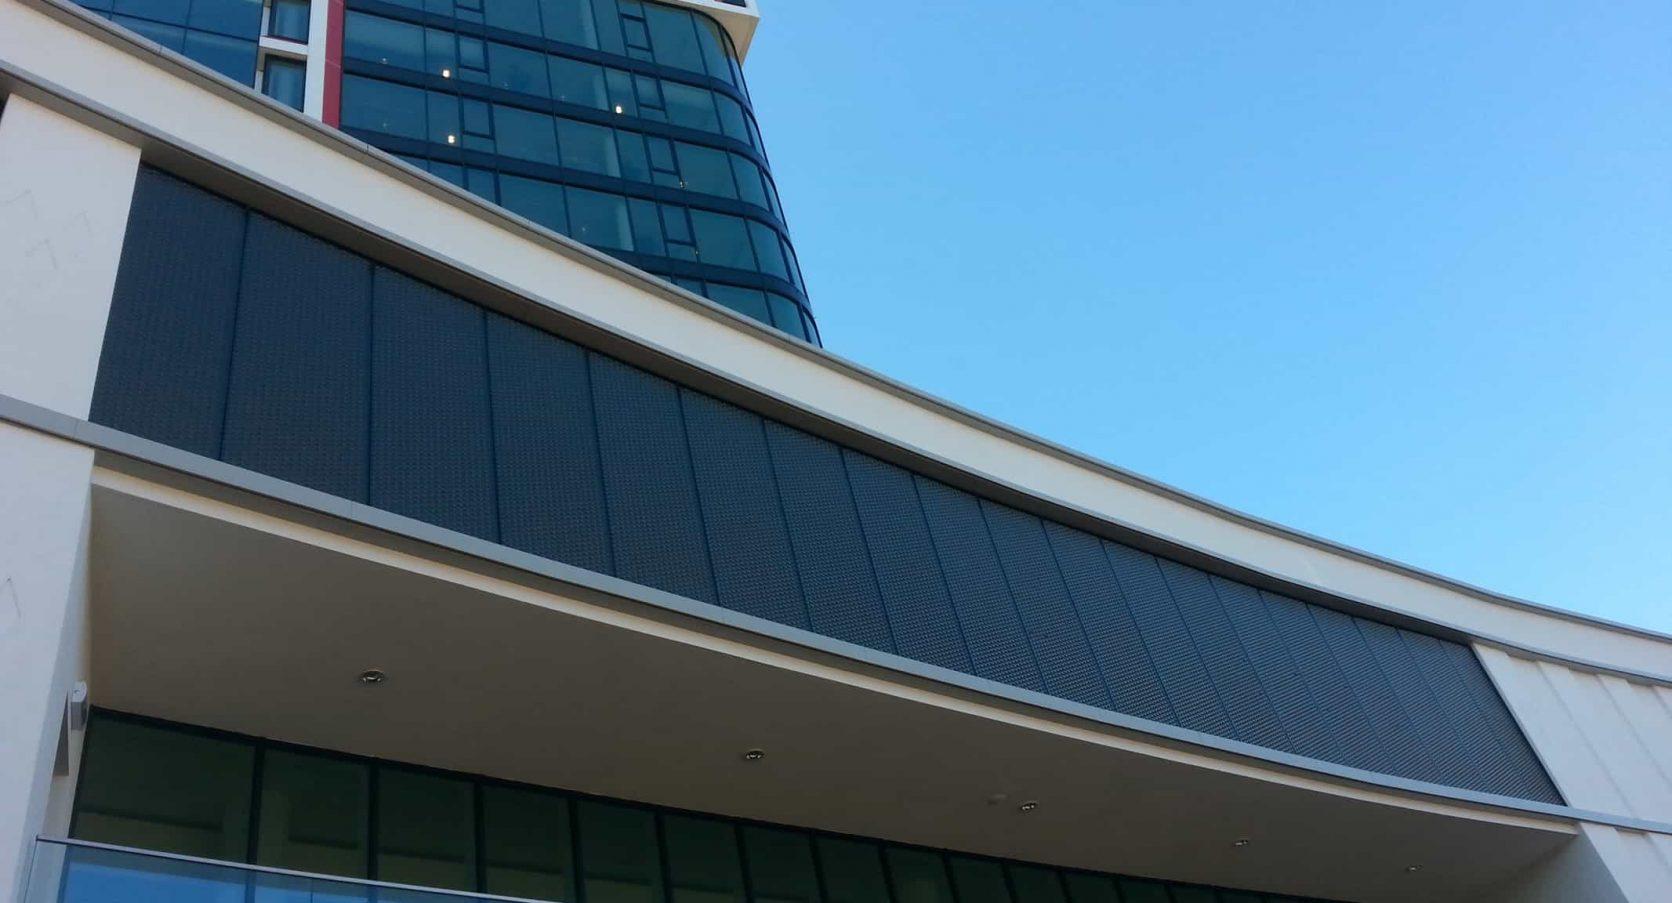 Vooraanzicht van het Stadhuis in Almelo, dat is uitgerust met MD Strekmetaal gevelbekleding